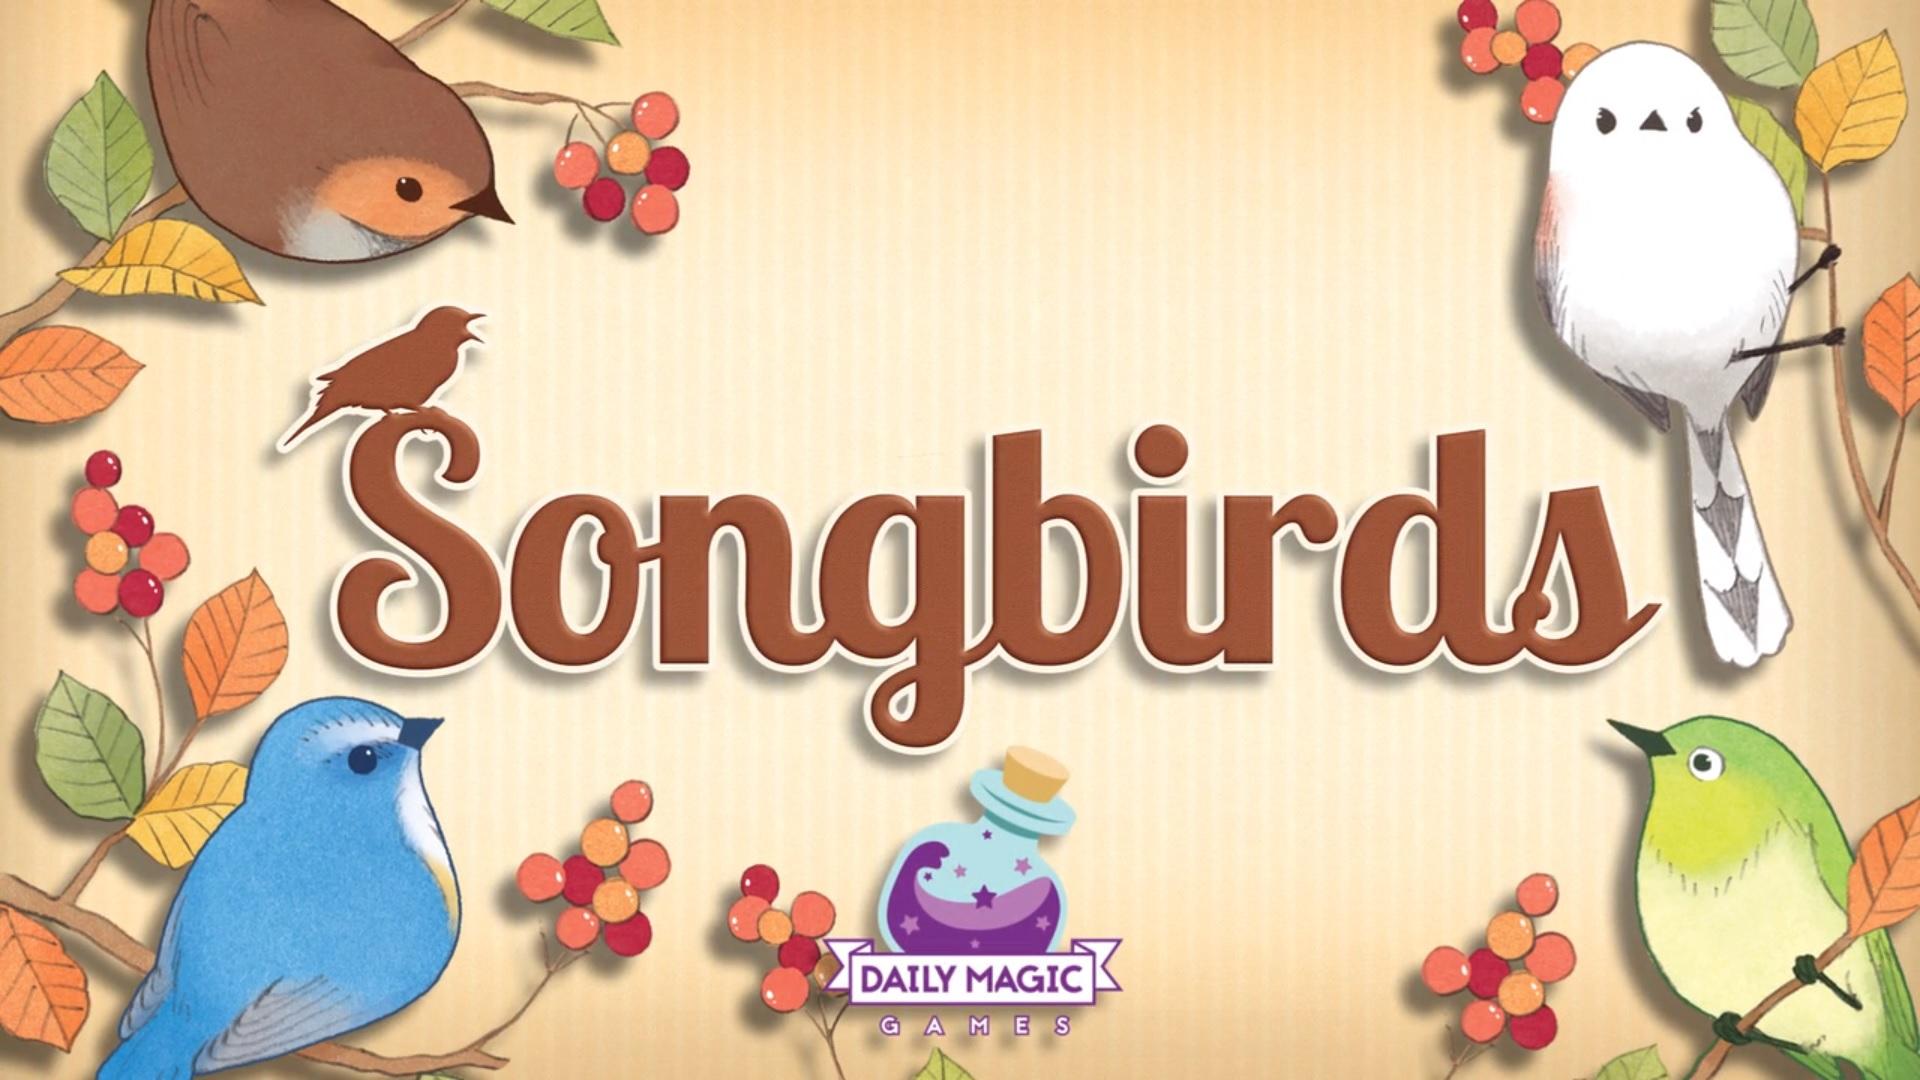 The loud bird gets the worm… Songbirds!